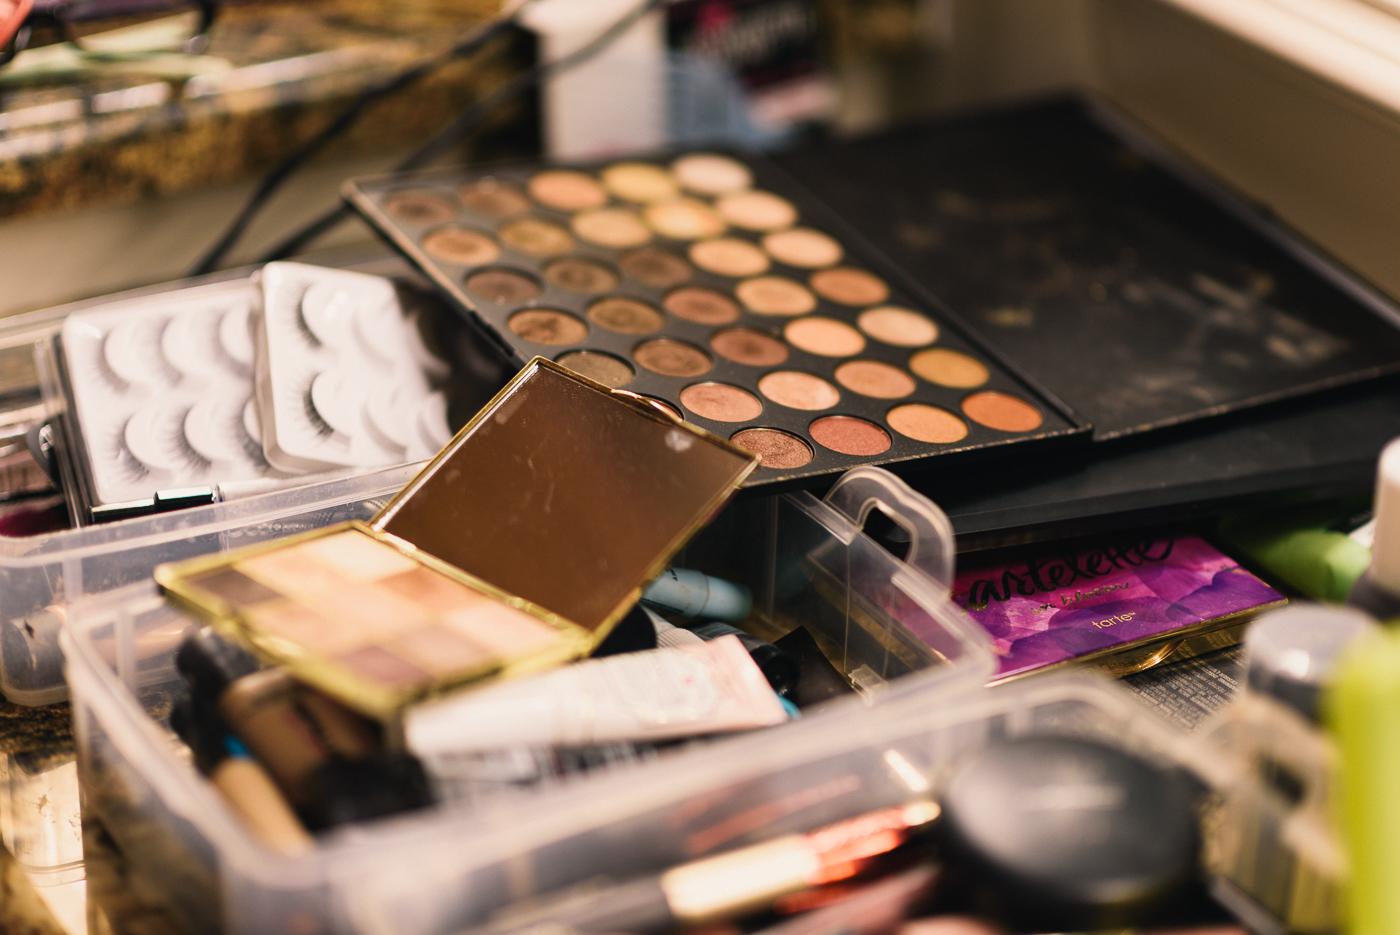 hair and makeup wedding day getting ready fake eyelashes eyeshadow palette